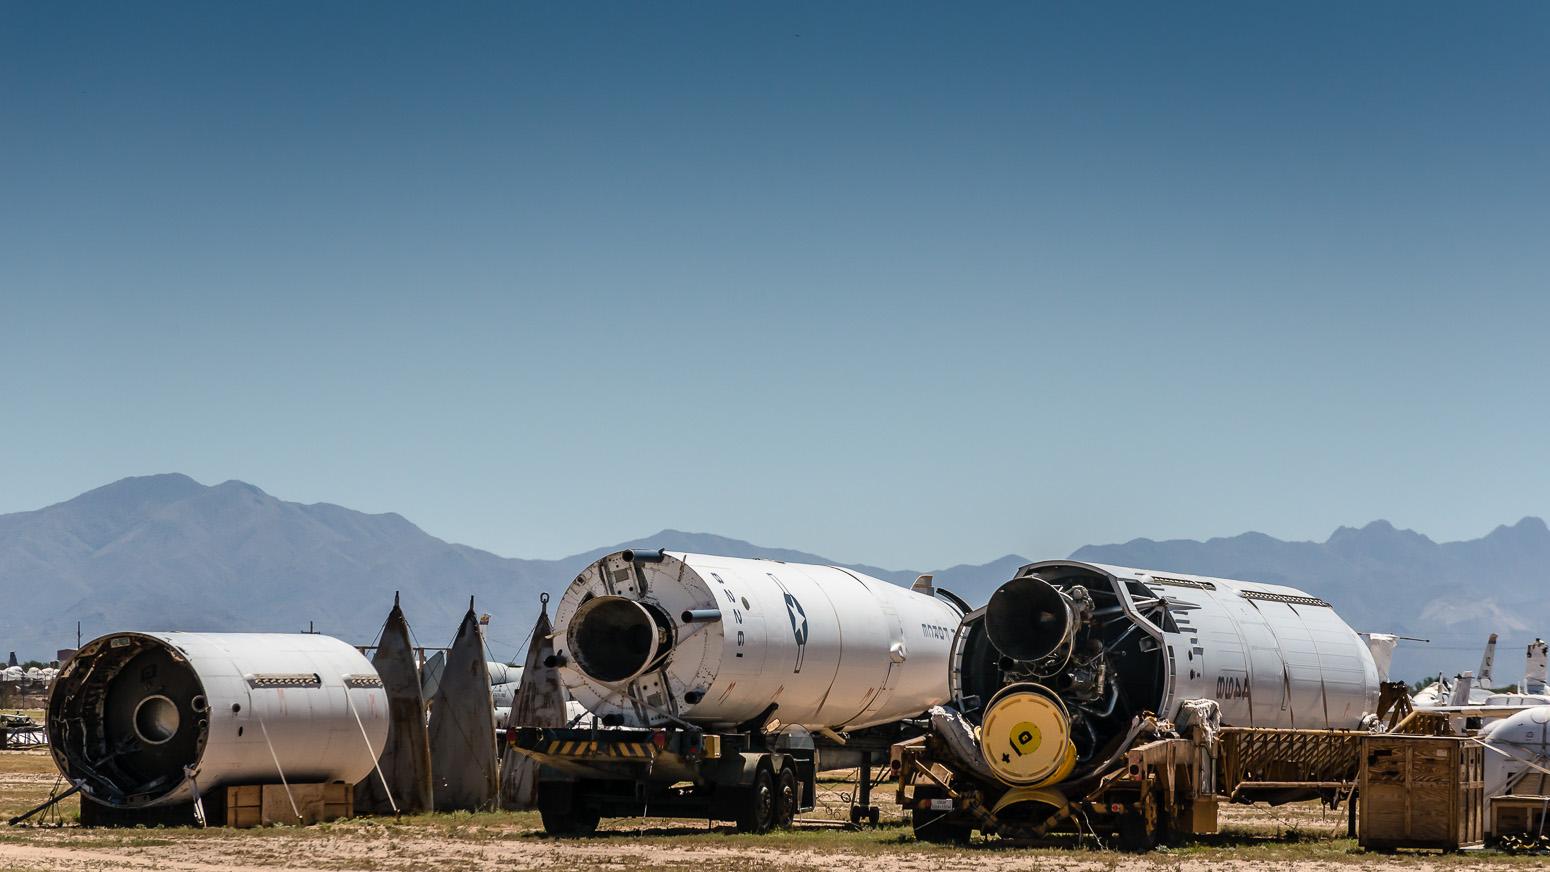 TITAN II ICBM, The Boneyard, Davis-Monthan Air Force Base, Tucson, USA